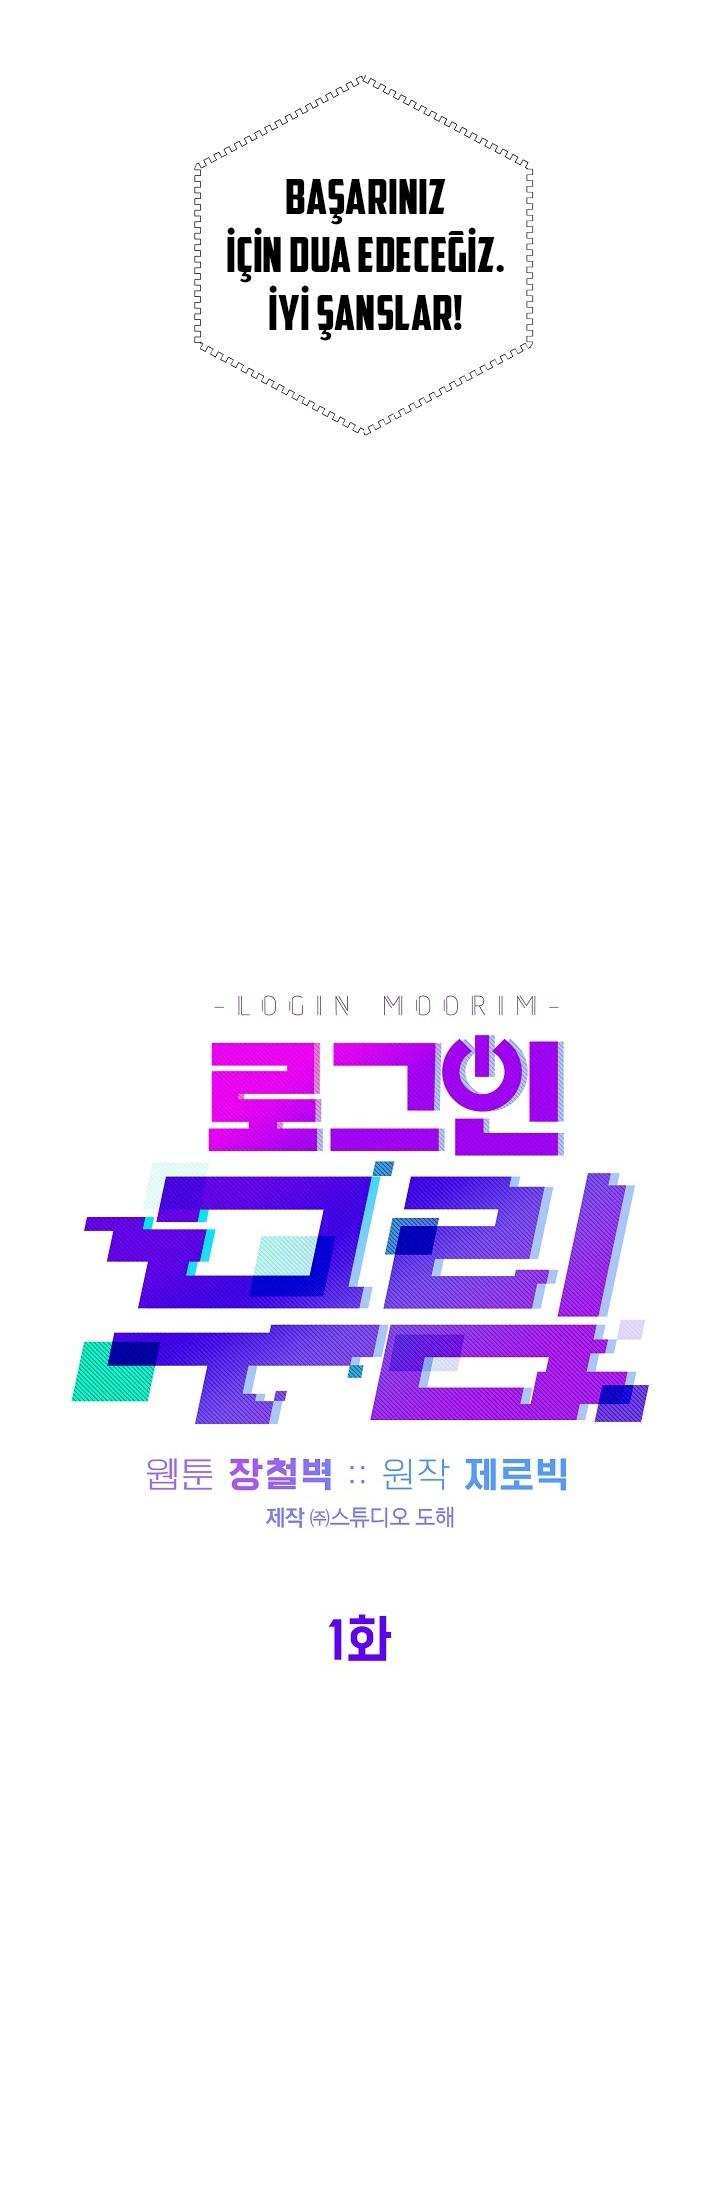 murim-loginbolum-1